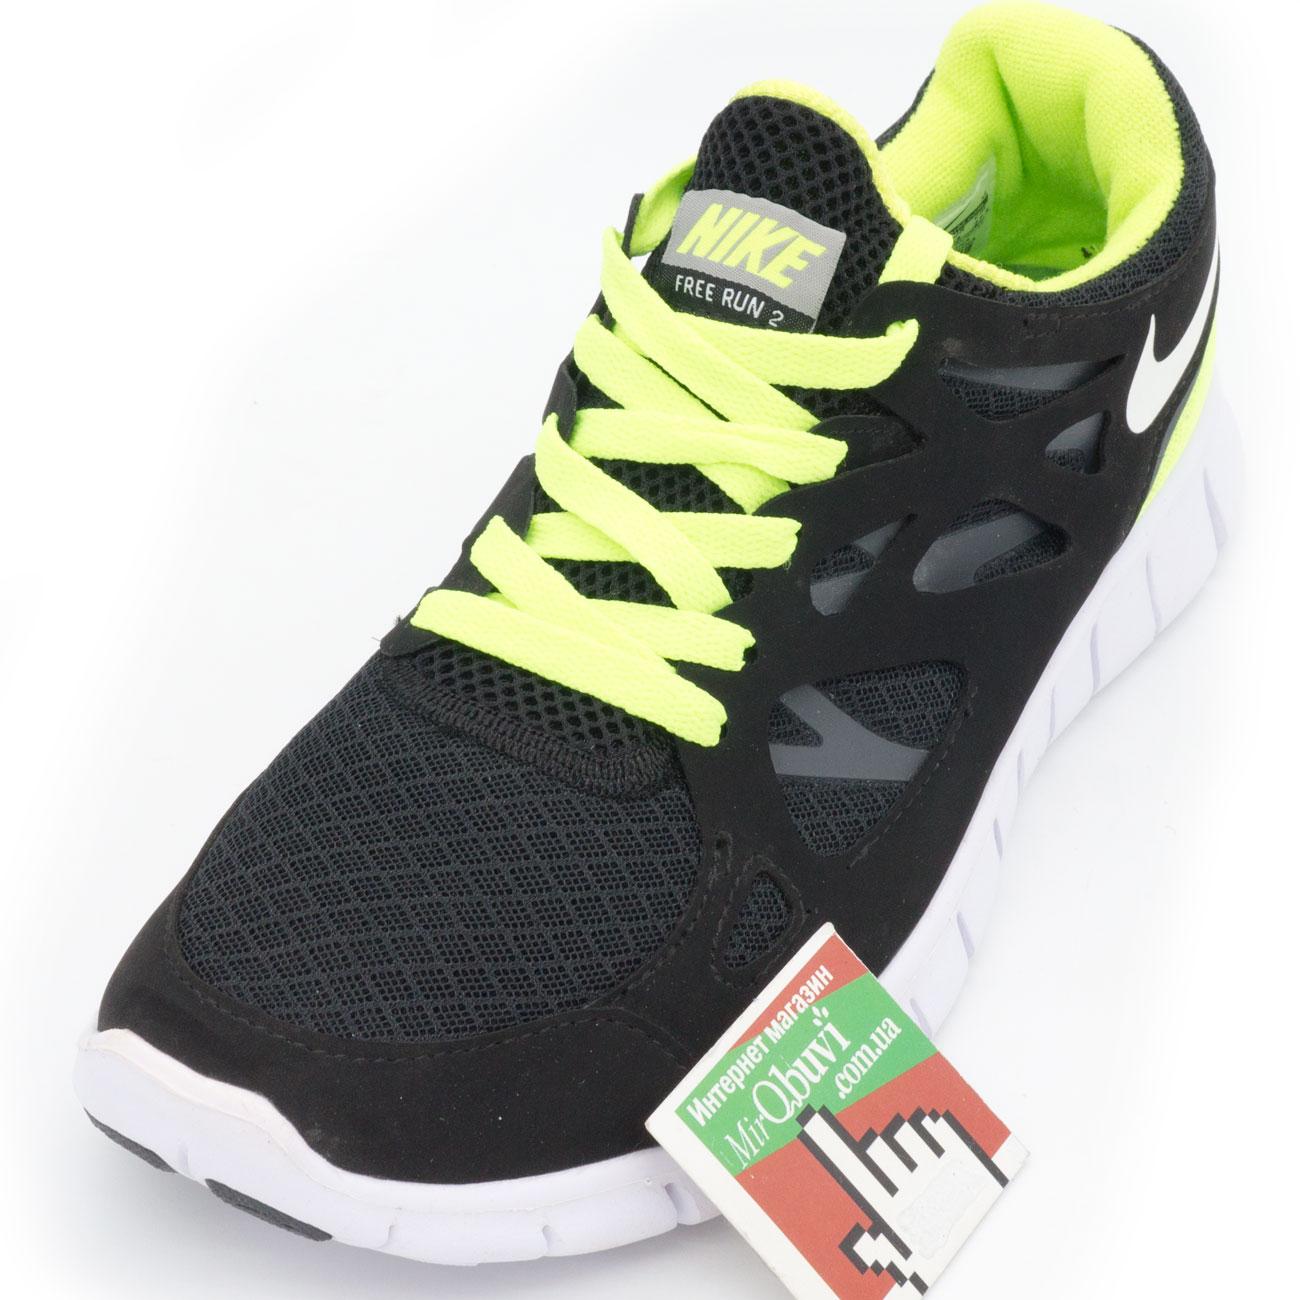 фото front Кроссовки для бега Nike Free Run 2 Найк Фри Ран, черно-зеленые front